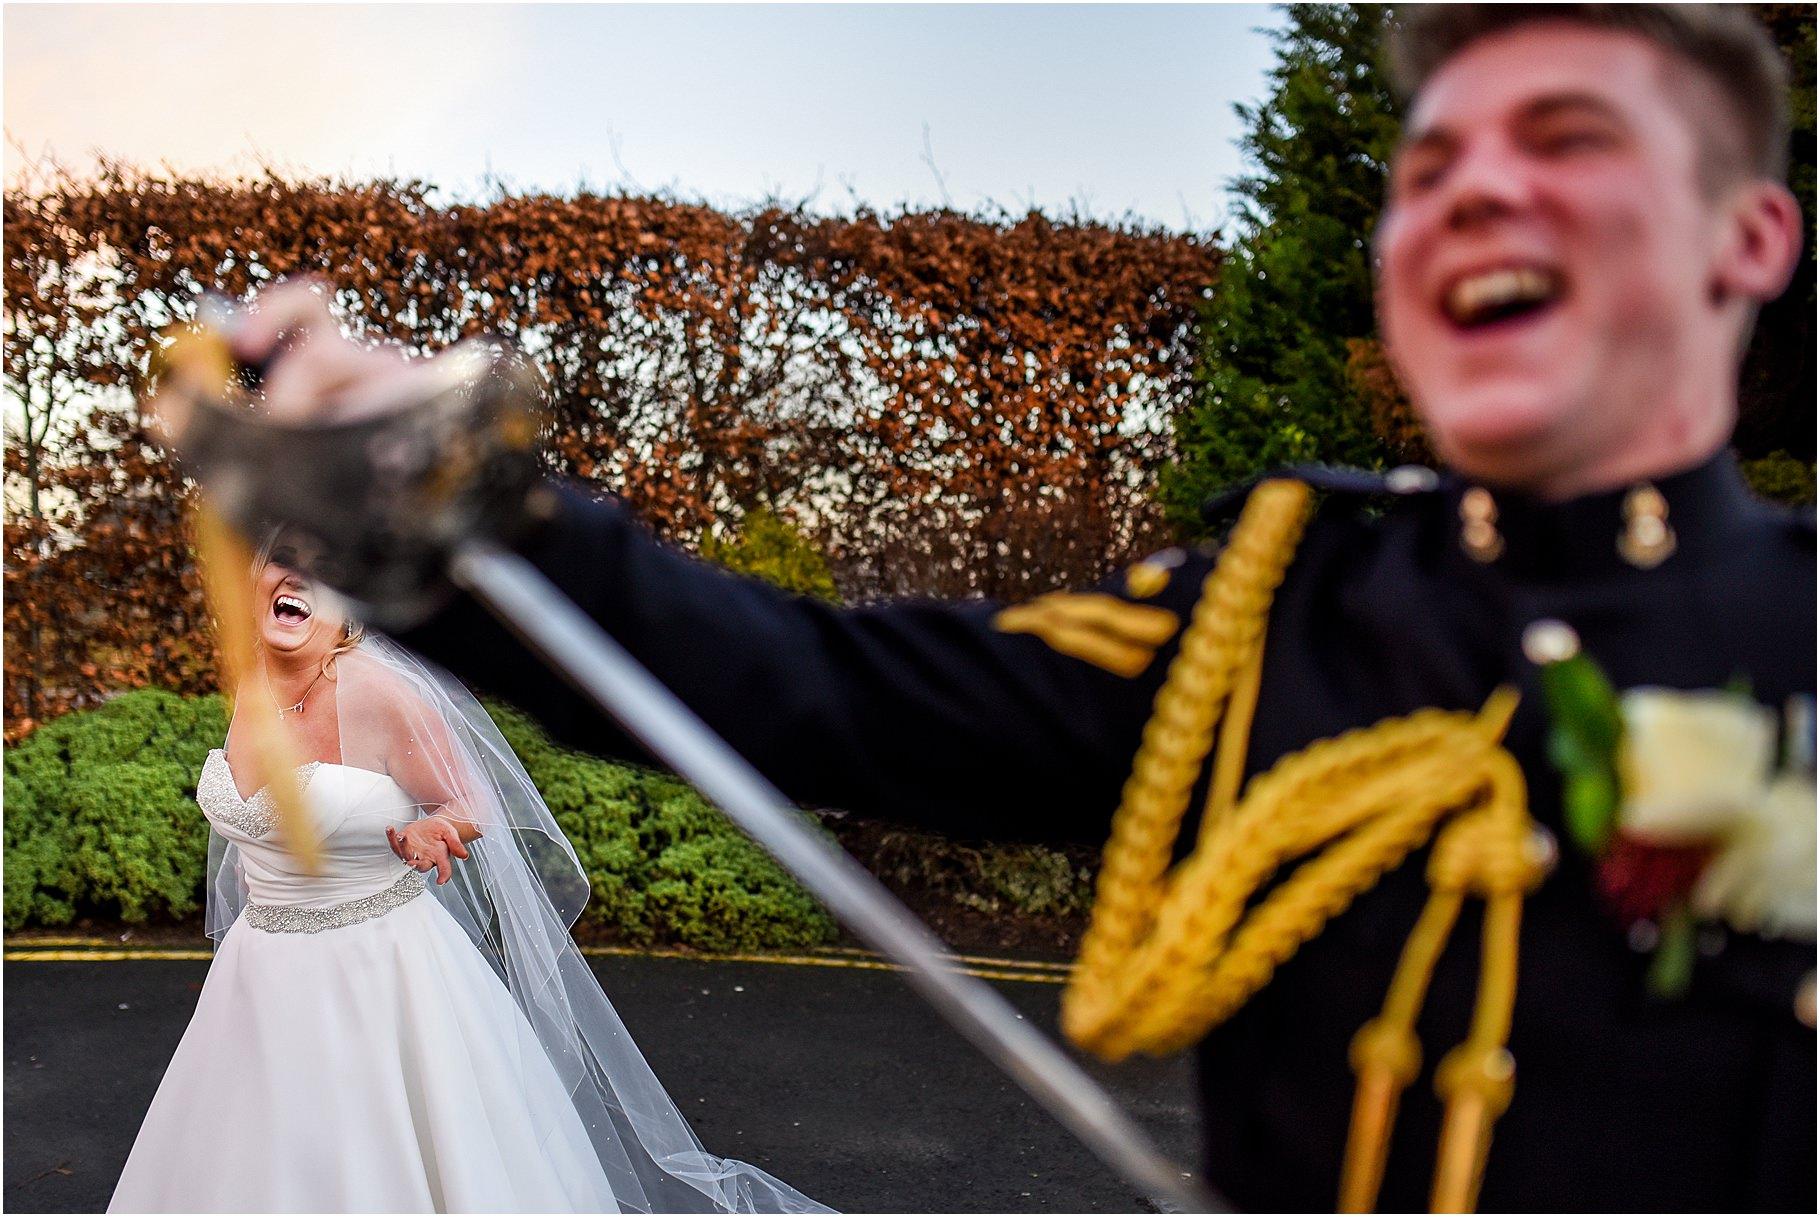 dan-wootton-photography-2017-weddings-009.jpg